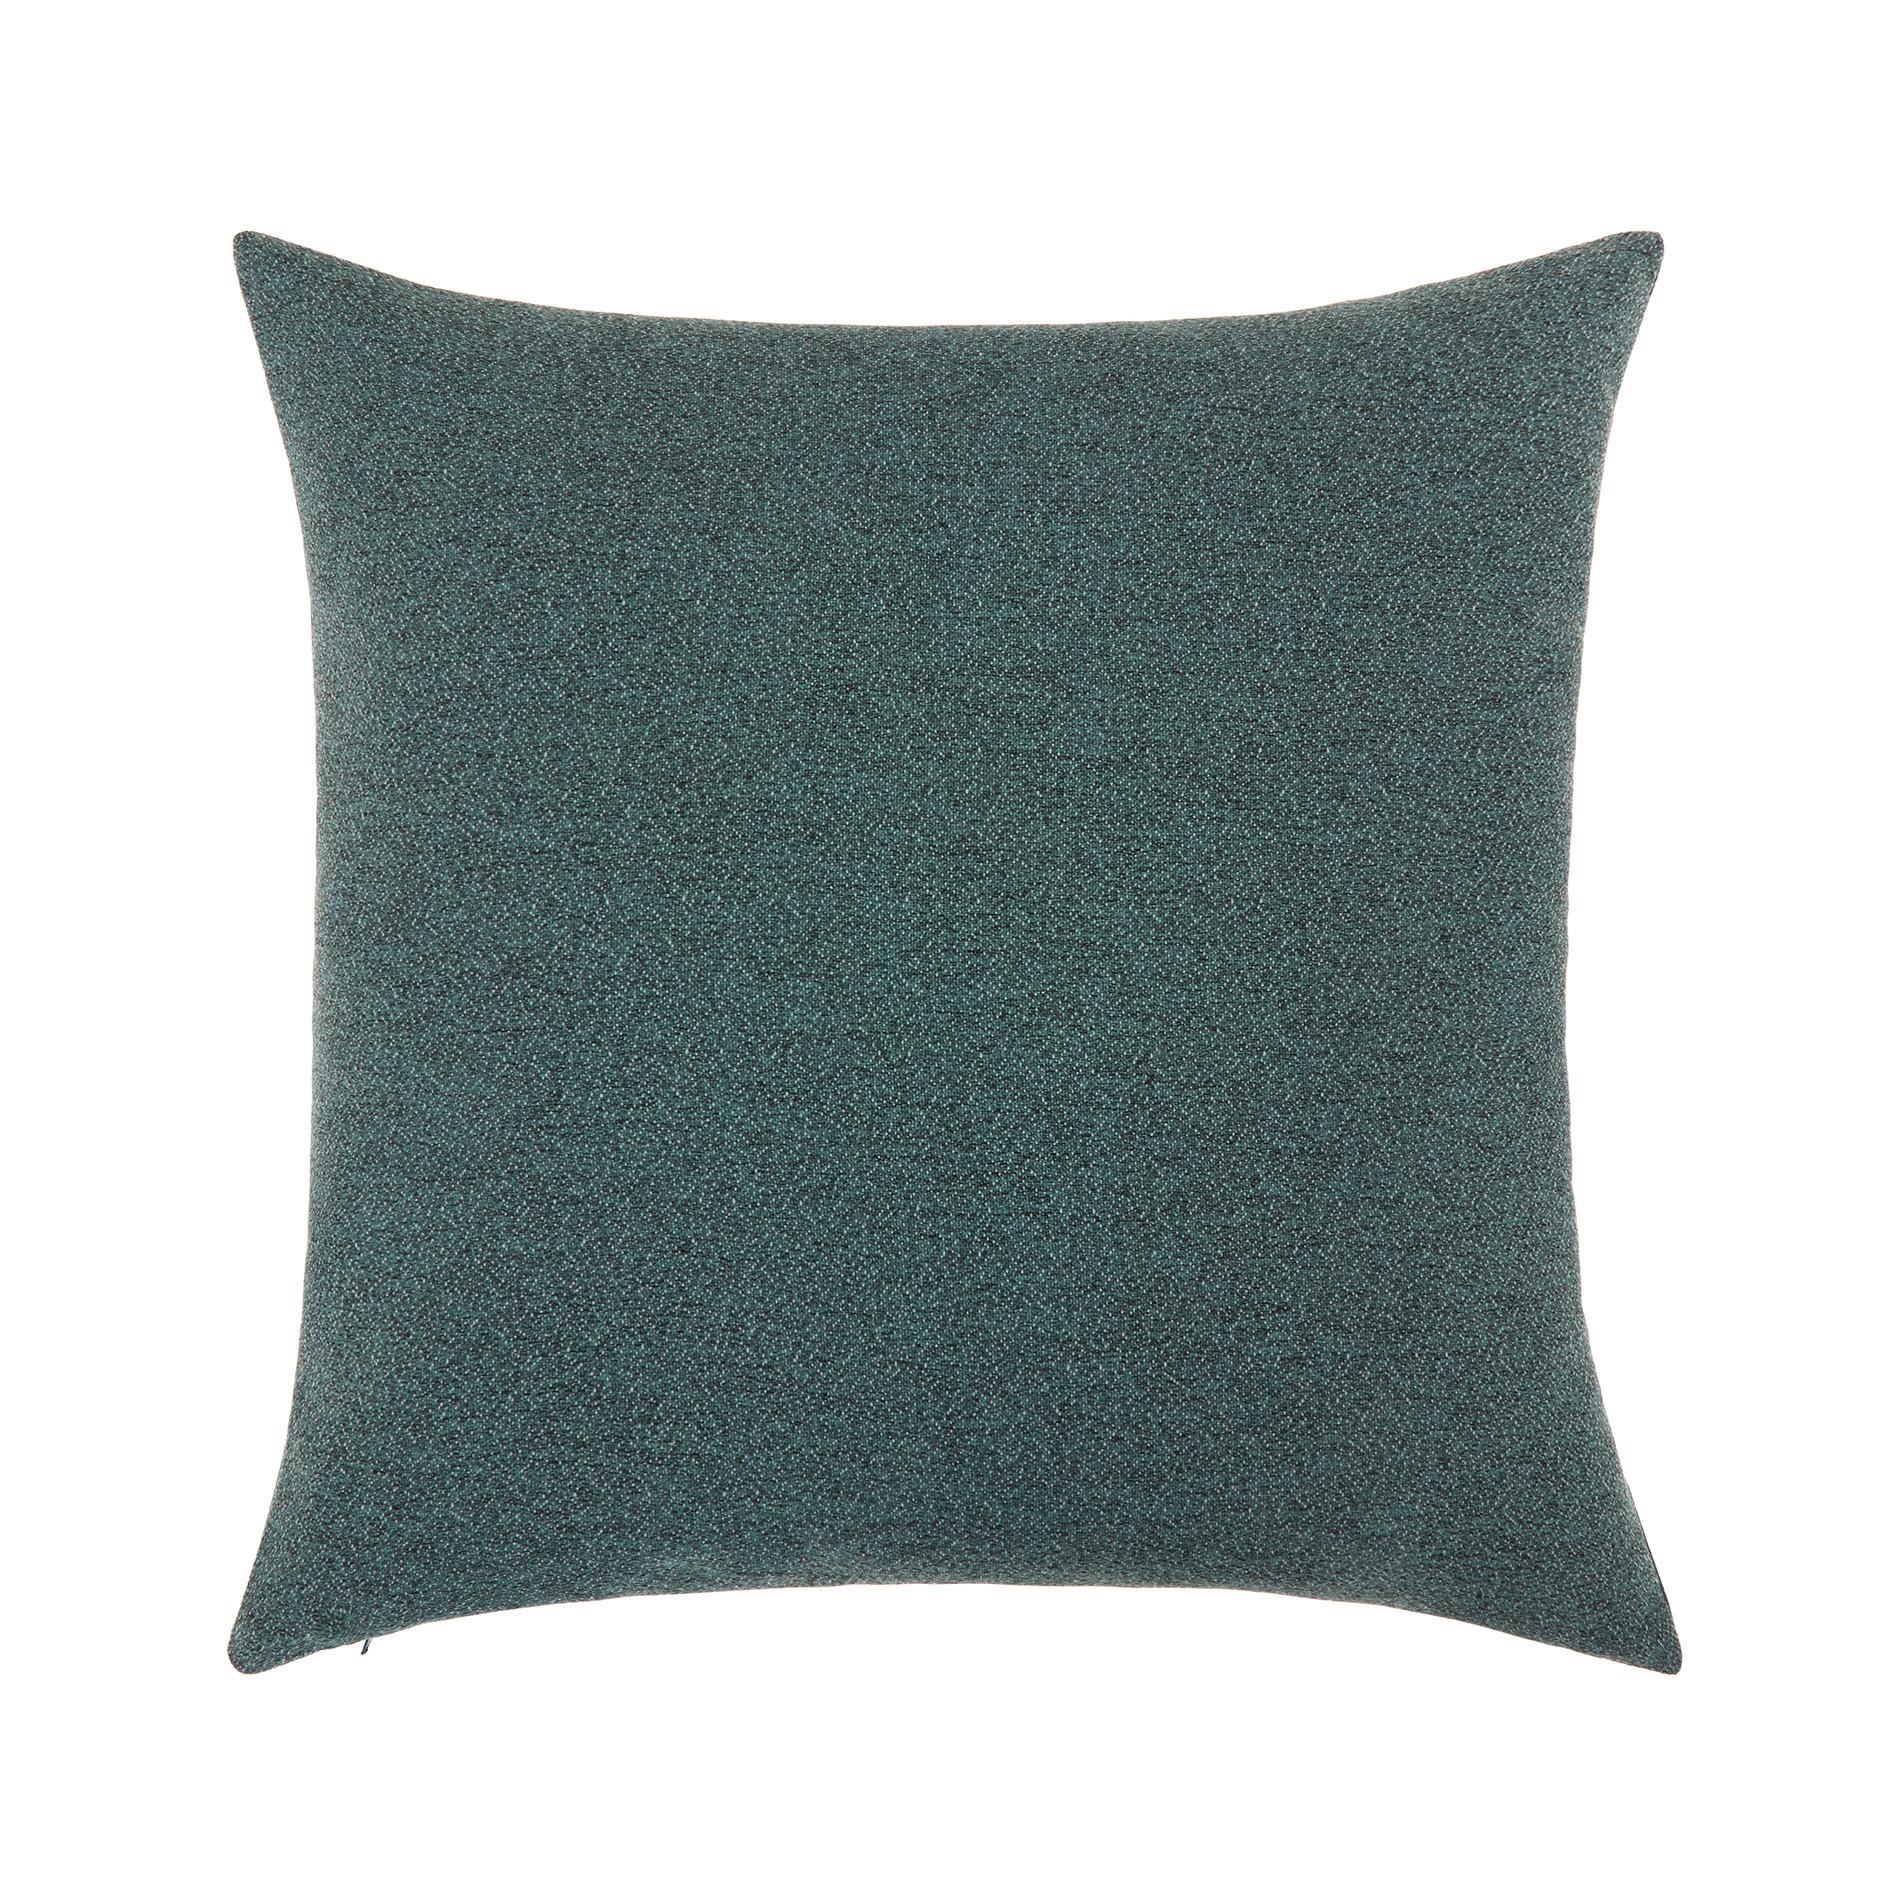 Cuscino sfumature melange 50x50cm, Verde scuro, large image number 0